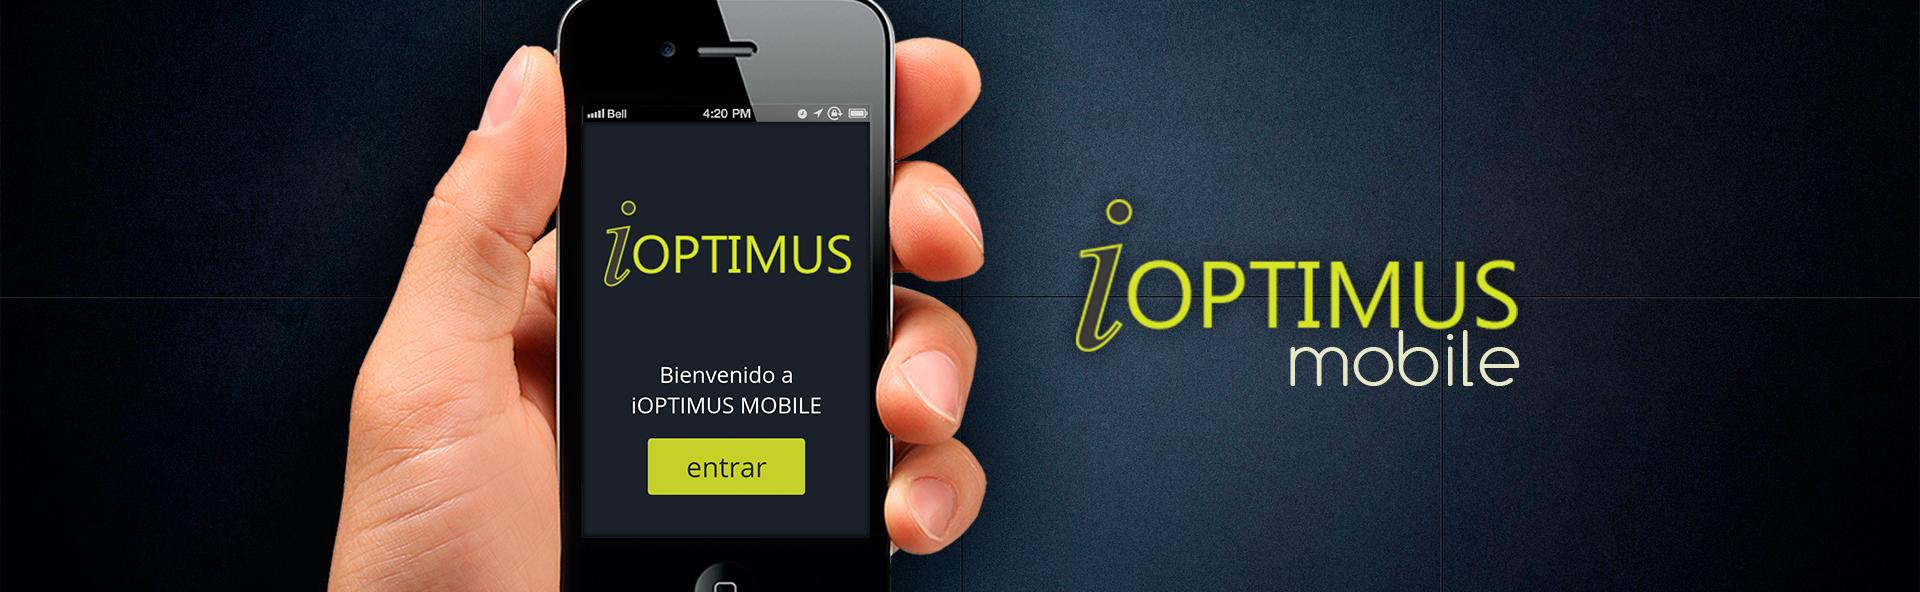 Disfruta de iOPTIMUS ya en tu móvil